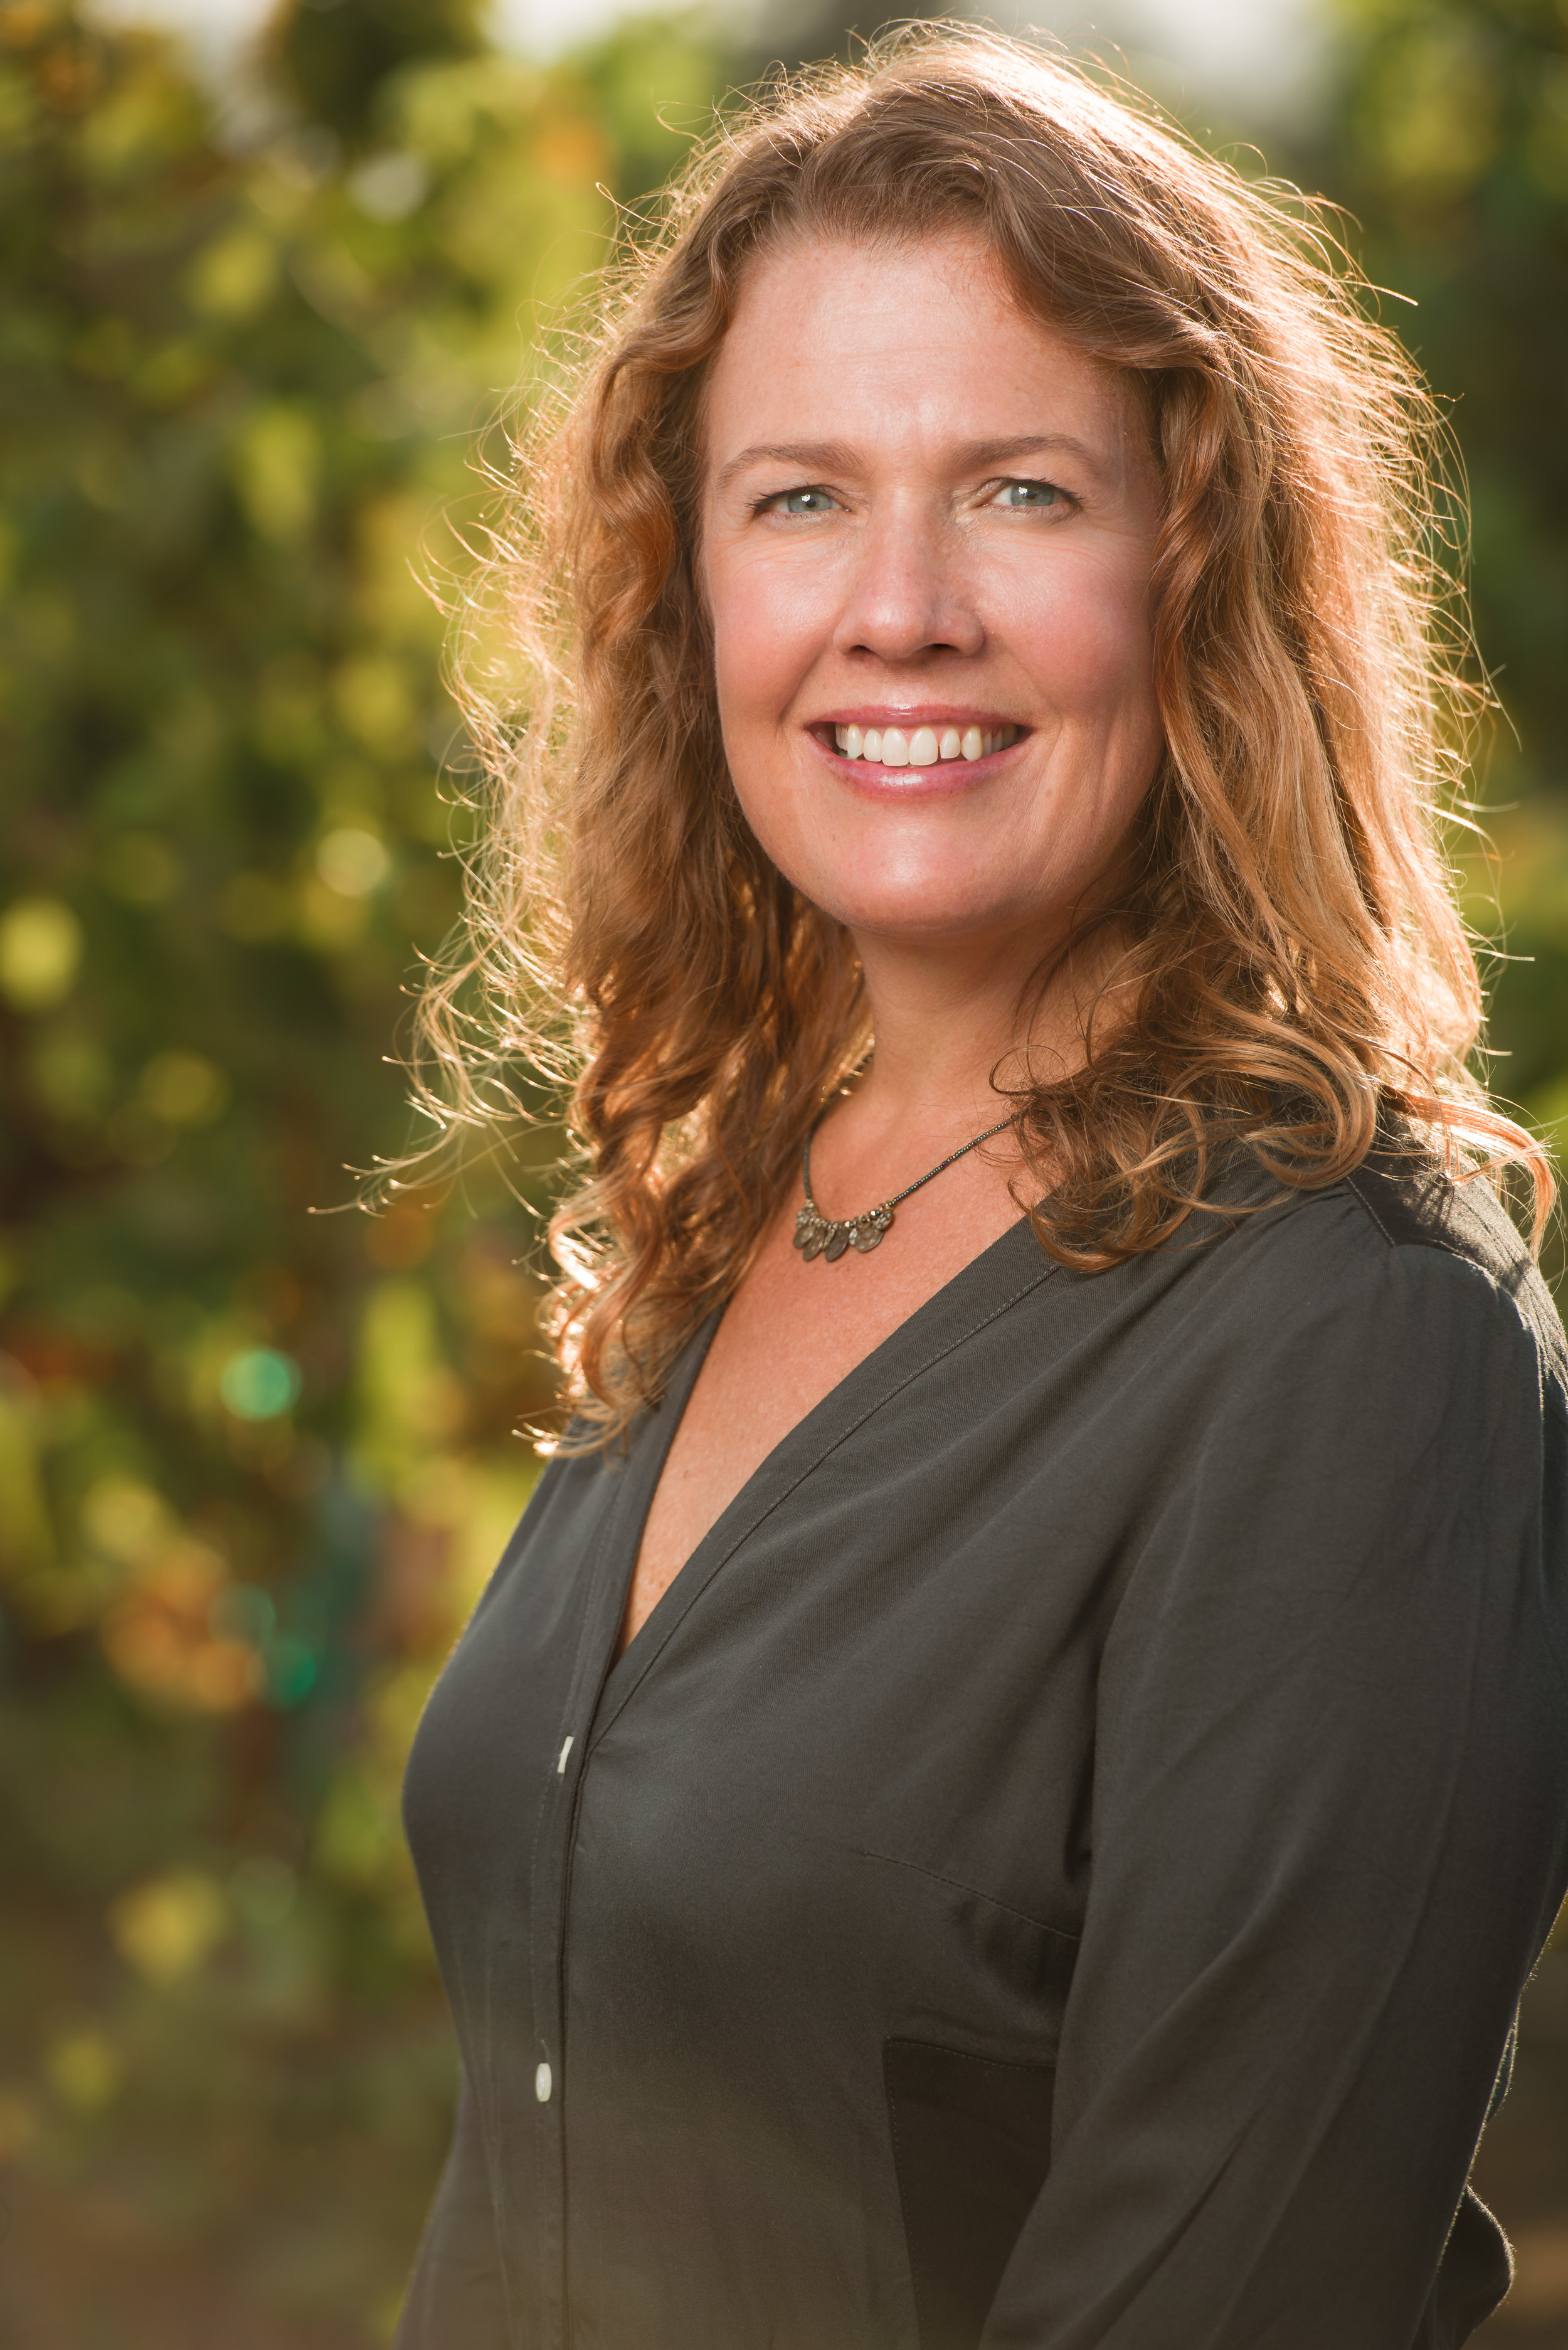 Allison Jordan - Executive Director of the California Sustainable Winegrowing Alliance